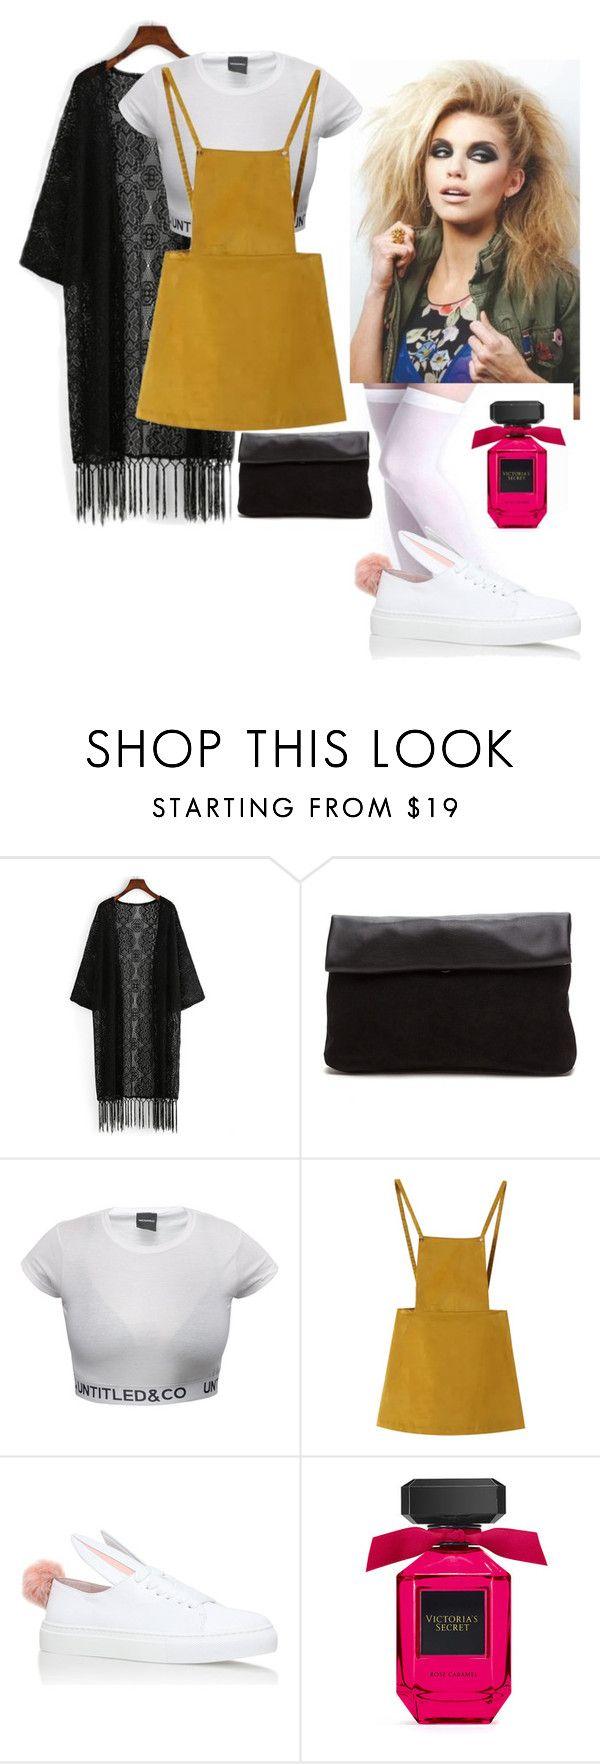 """Fashion "" by noags ❤ liked on Polyvore featuring beauty, Chicnova Fashion and Minna Parikka"